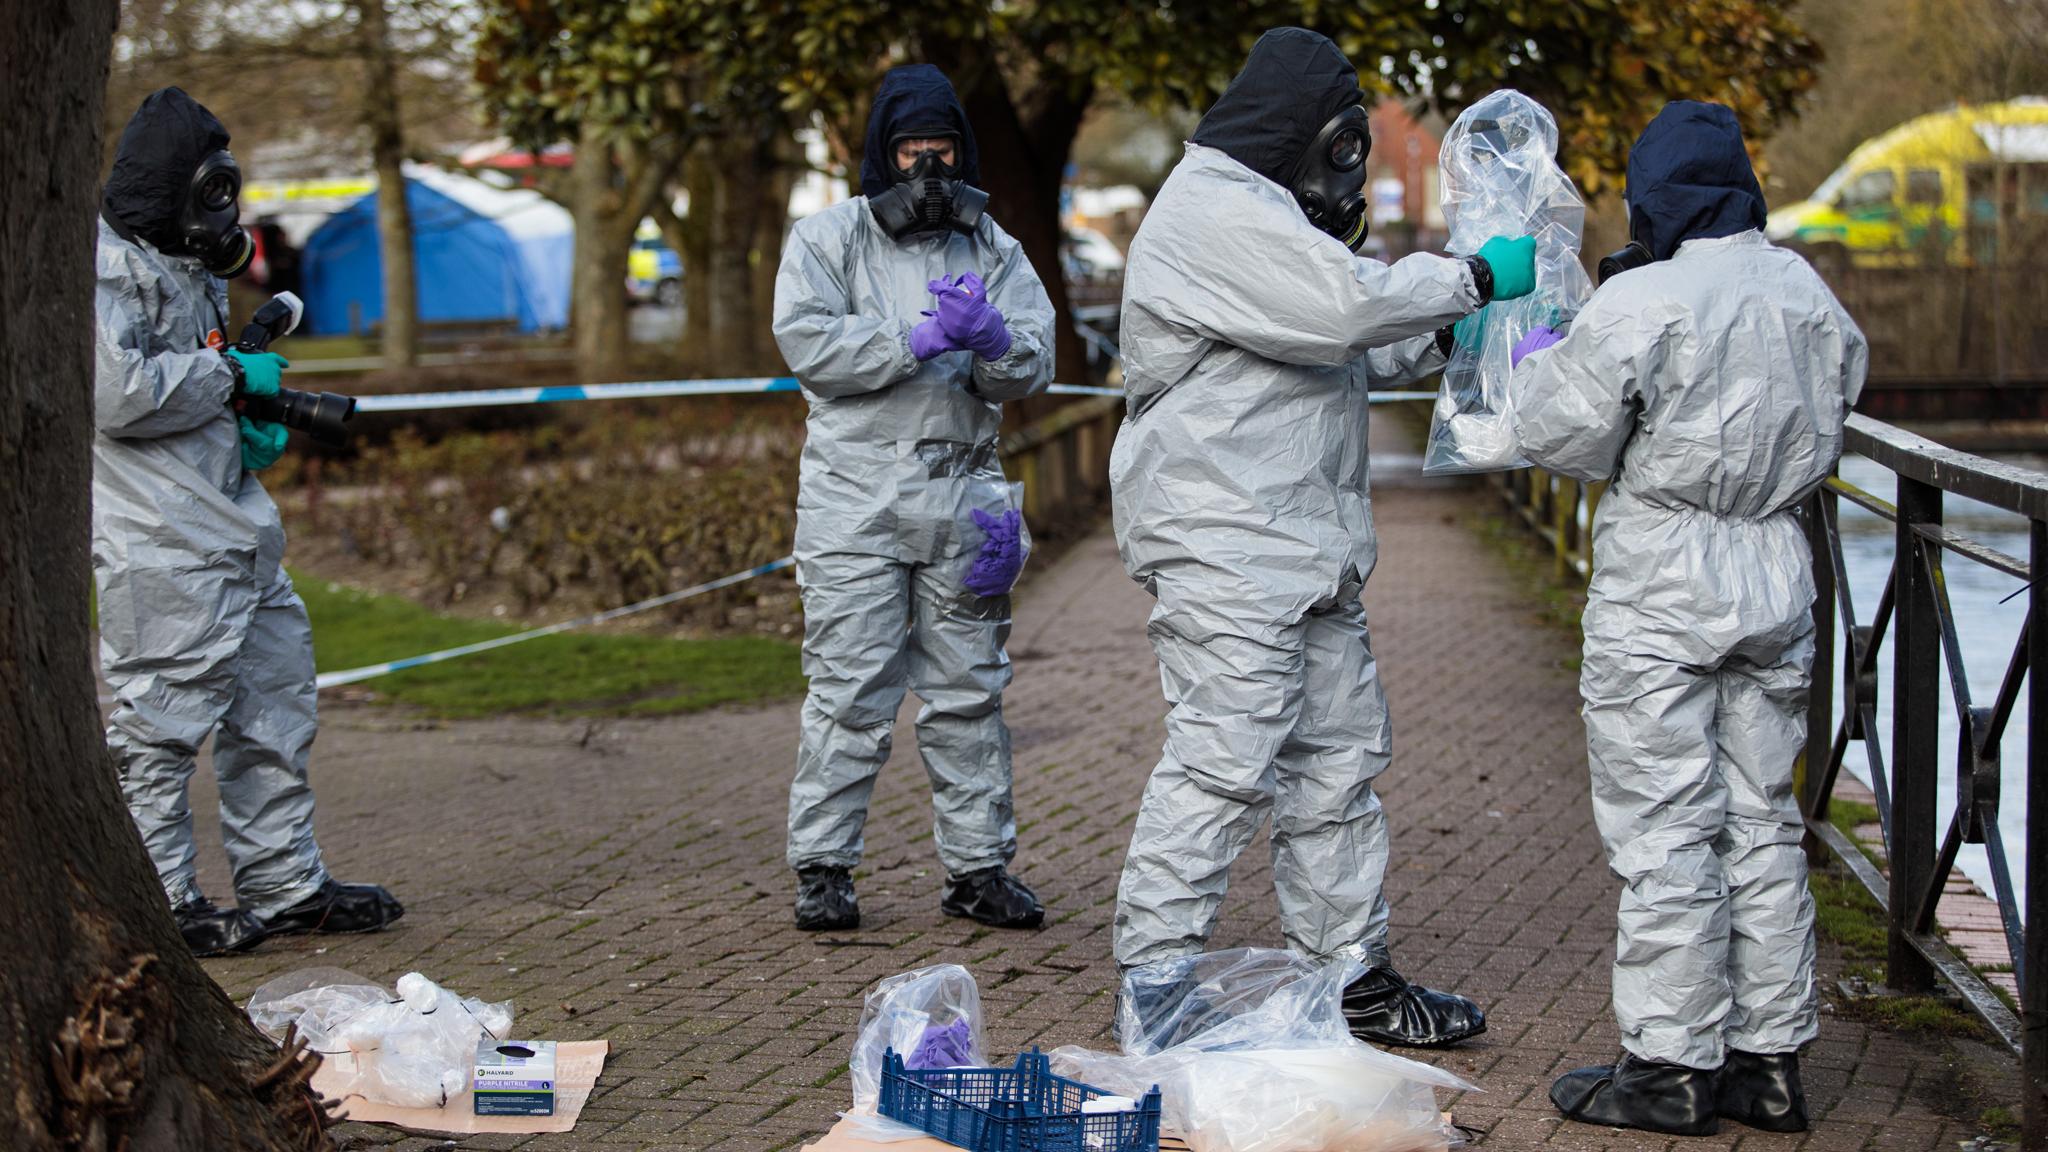 Russian spy: EU offers solidarity over Salisbury poisoning case